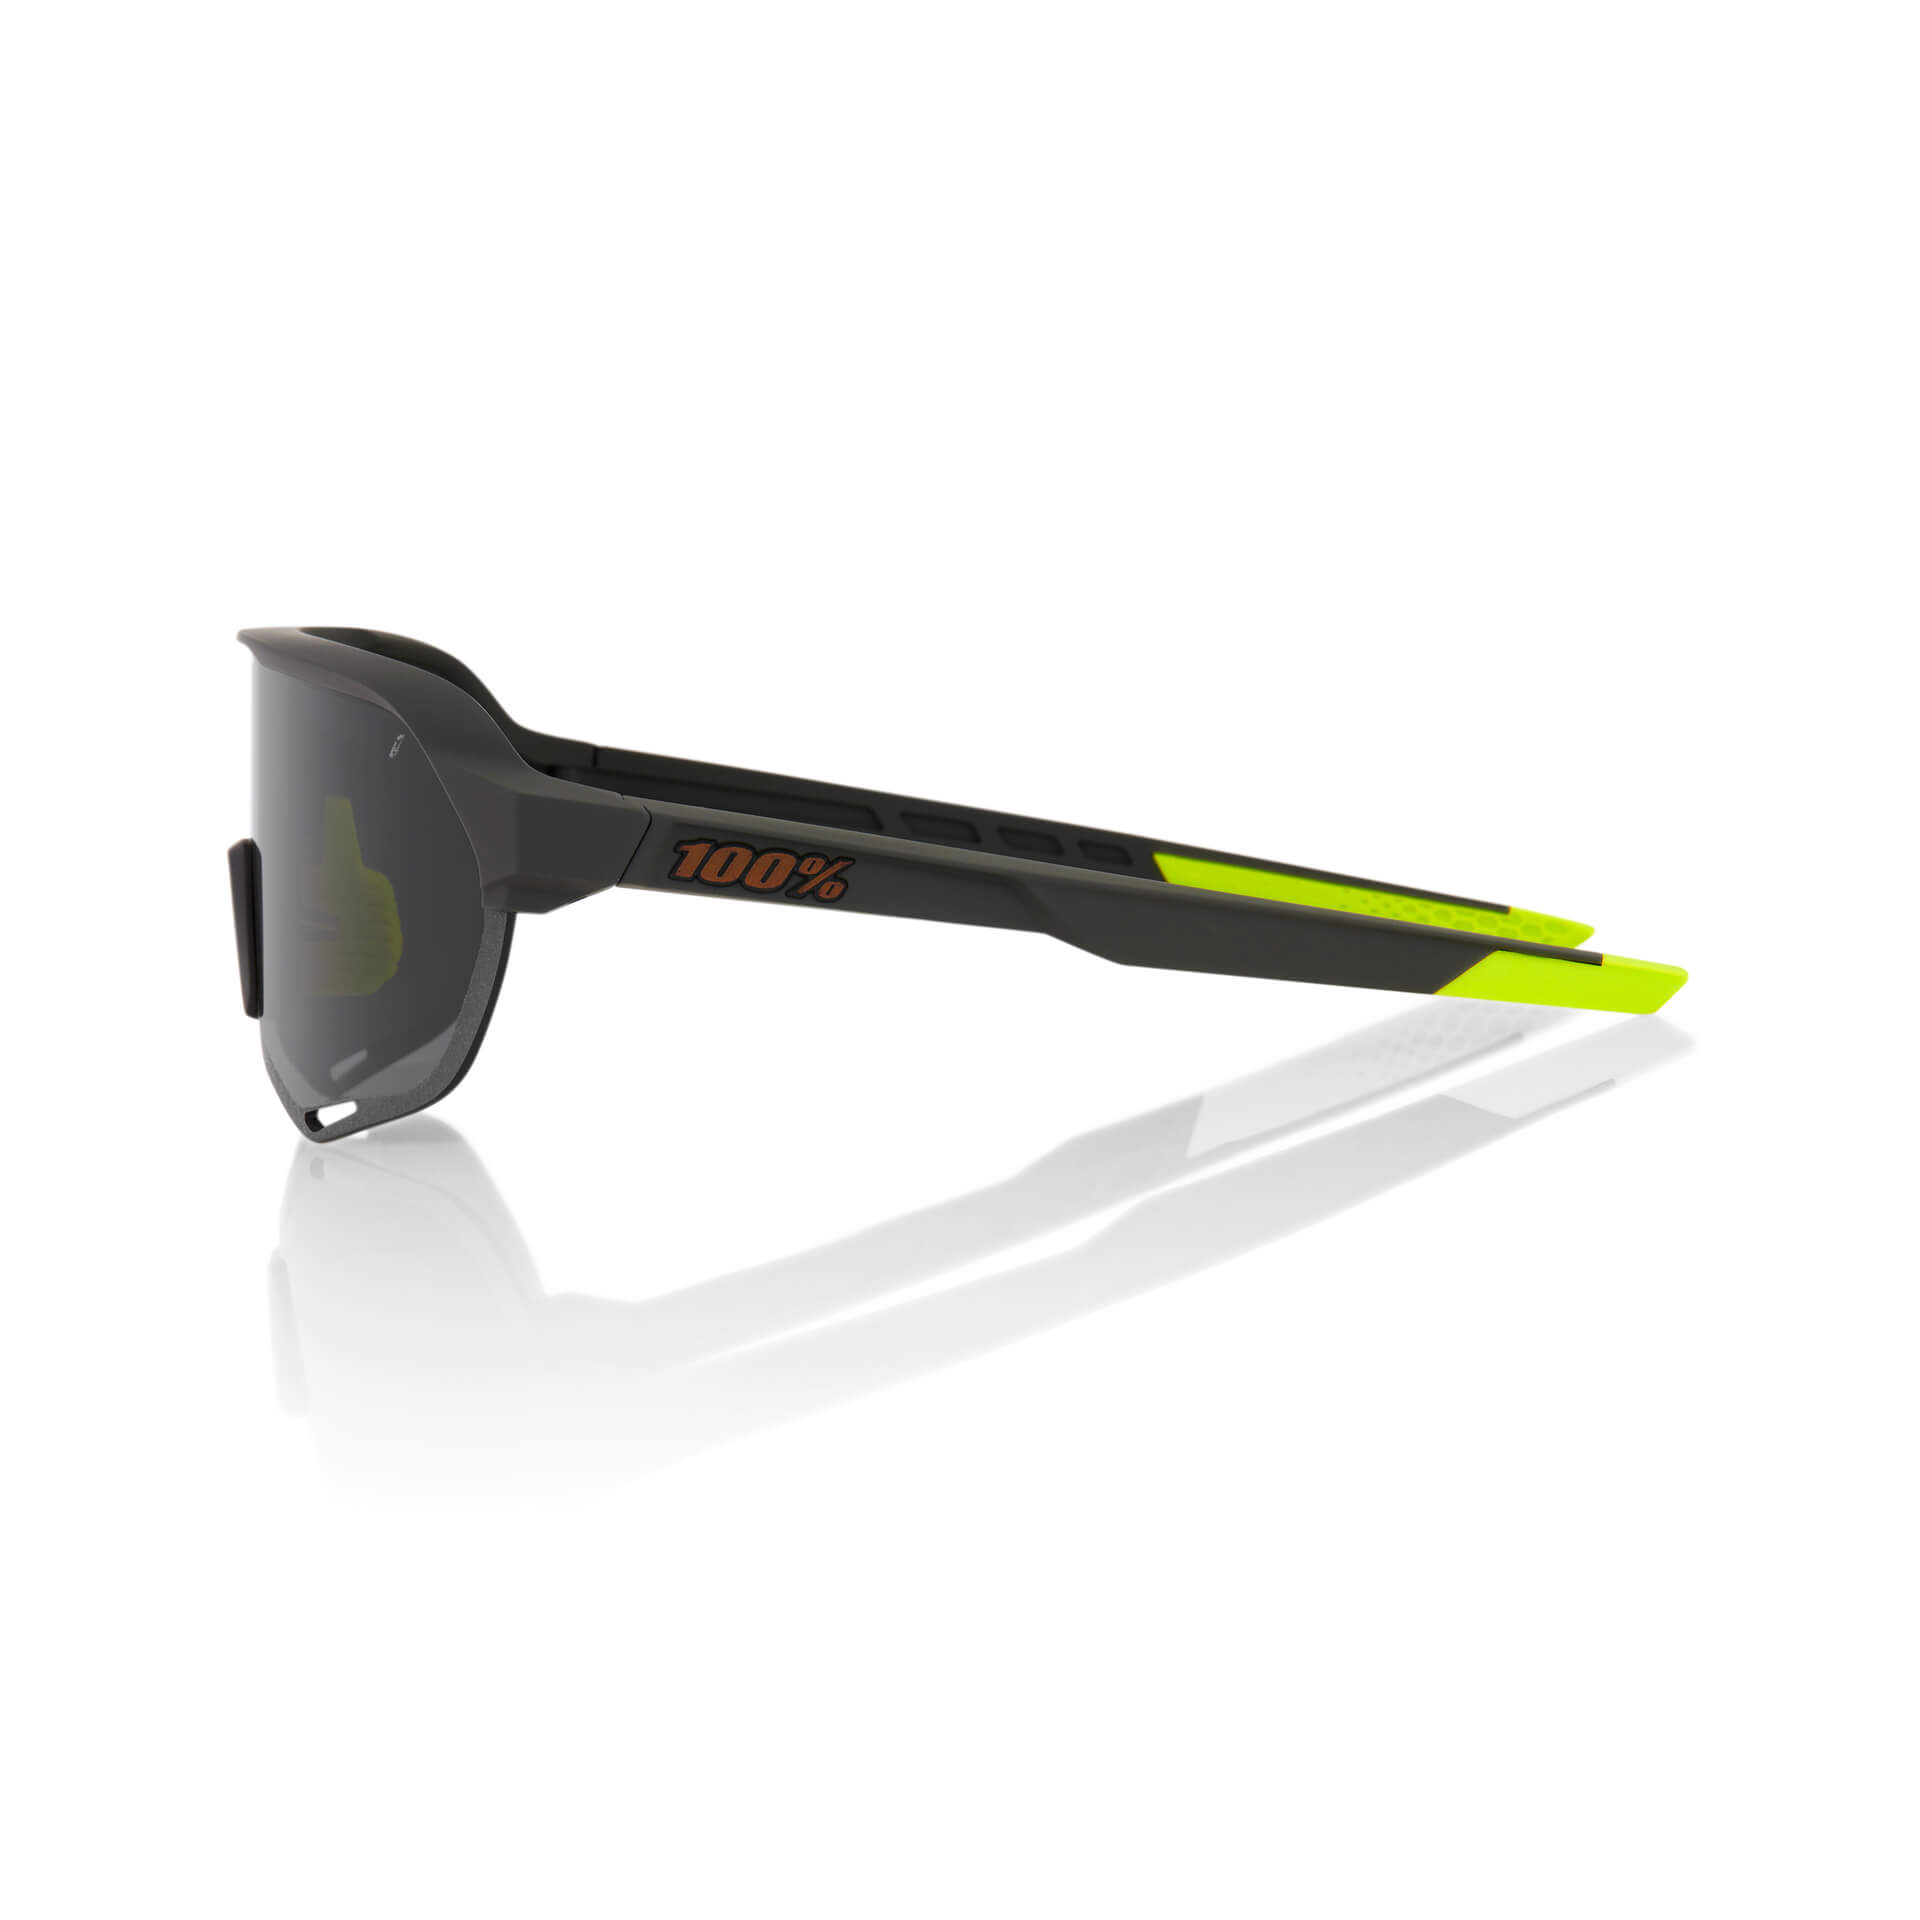 S2 – Soft Tact Cool Grey – Smoke Lens